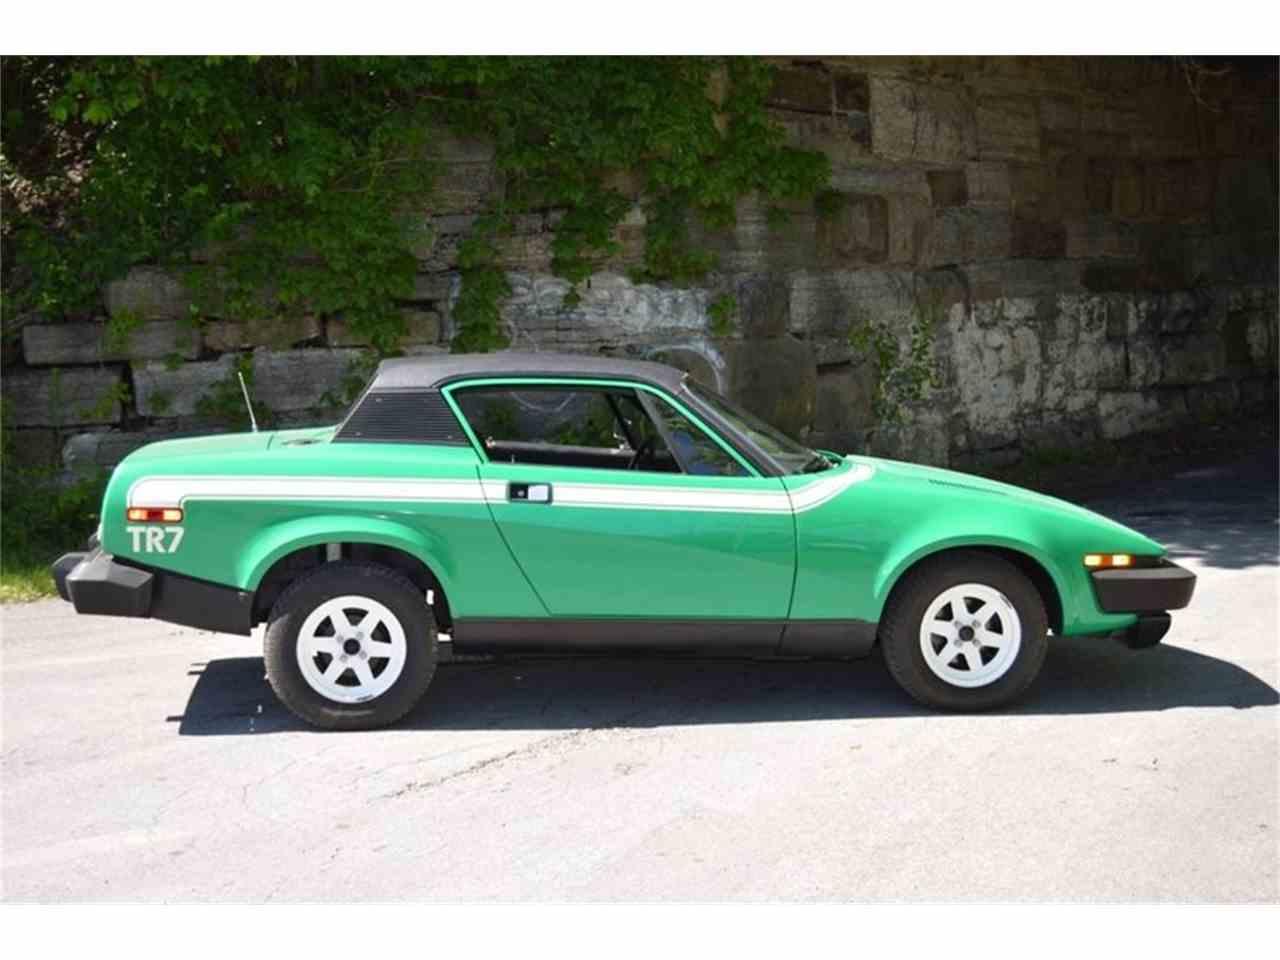 1976 Triumph TR7 for Sale | ClassicCars.com | CC-1022266